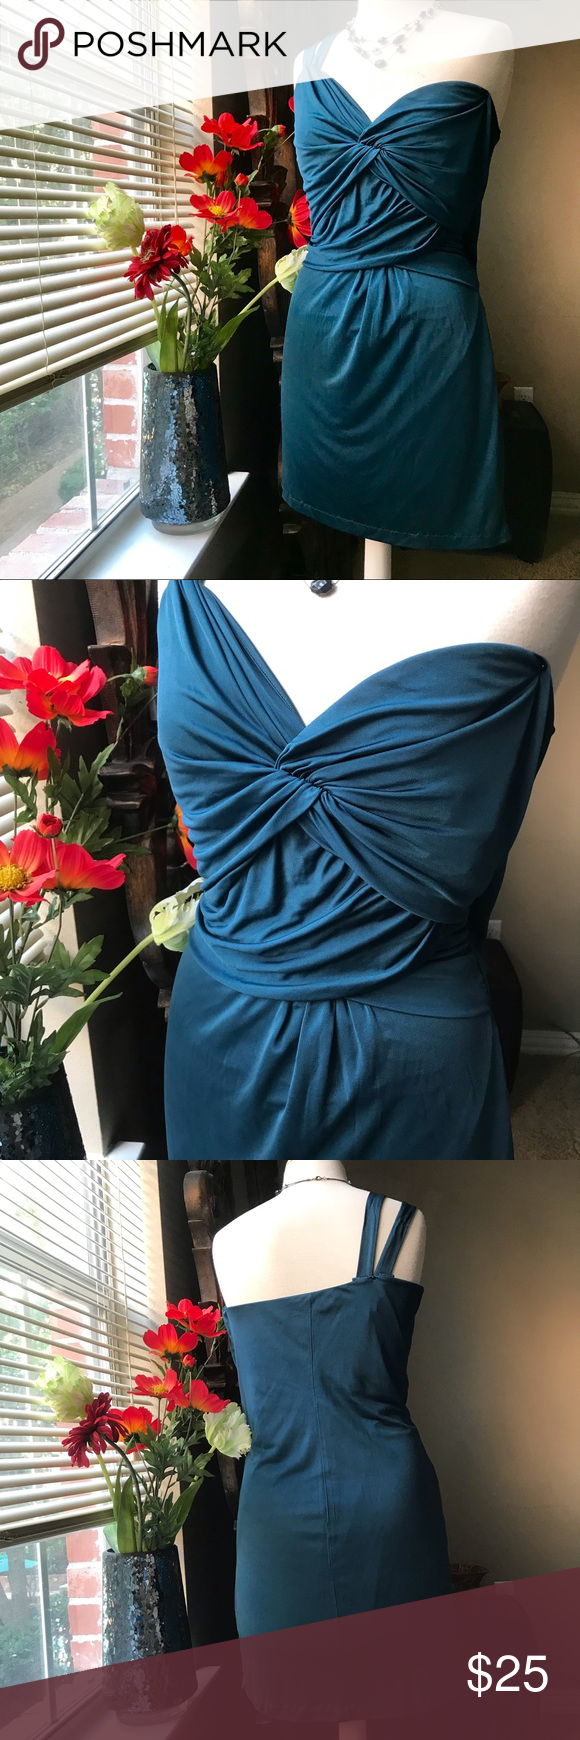 Vs Moda International Teal Dress Teal Cocktail Dress Teal Dress One Shoulder Cocktail Dress [ 1740 x 580 Pixel ]